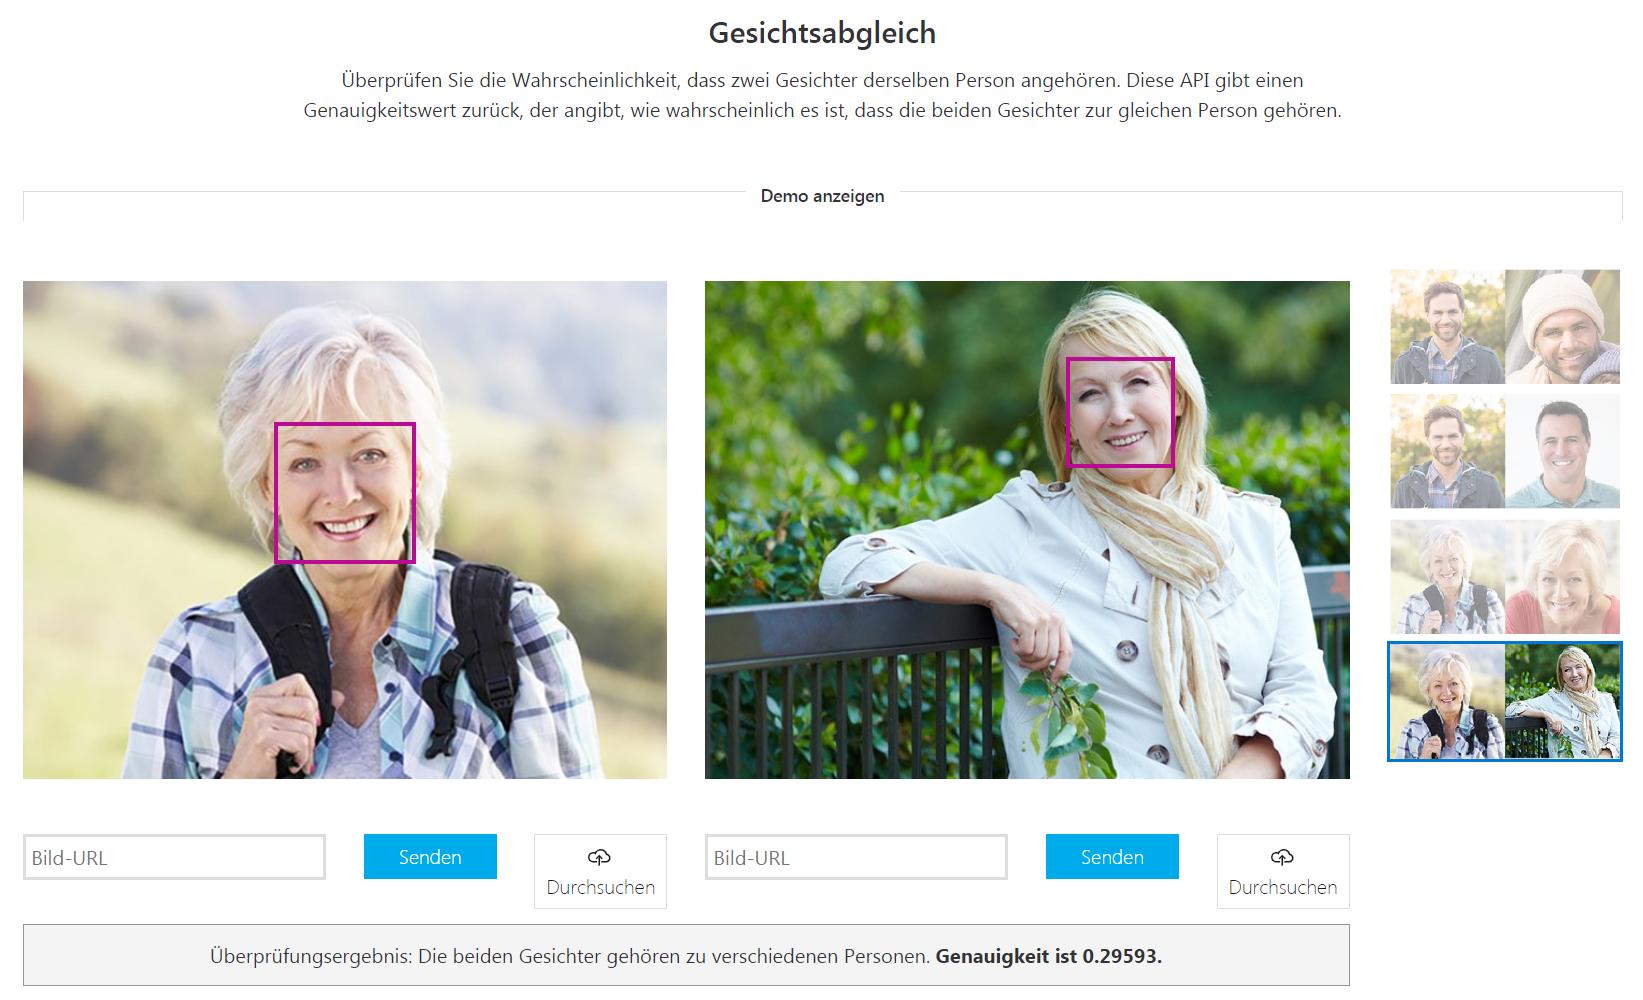 Cognitive Services Azure Gesichtsabgleich